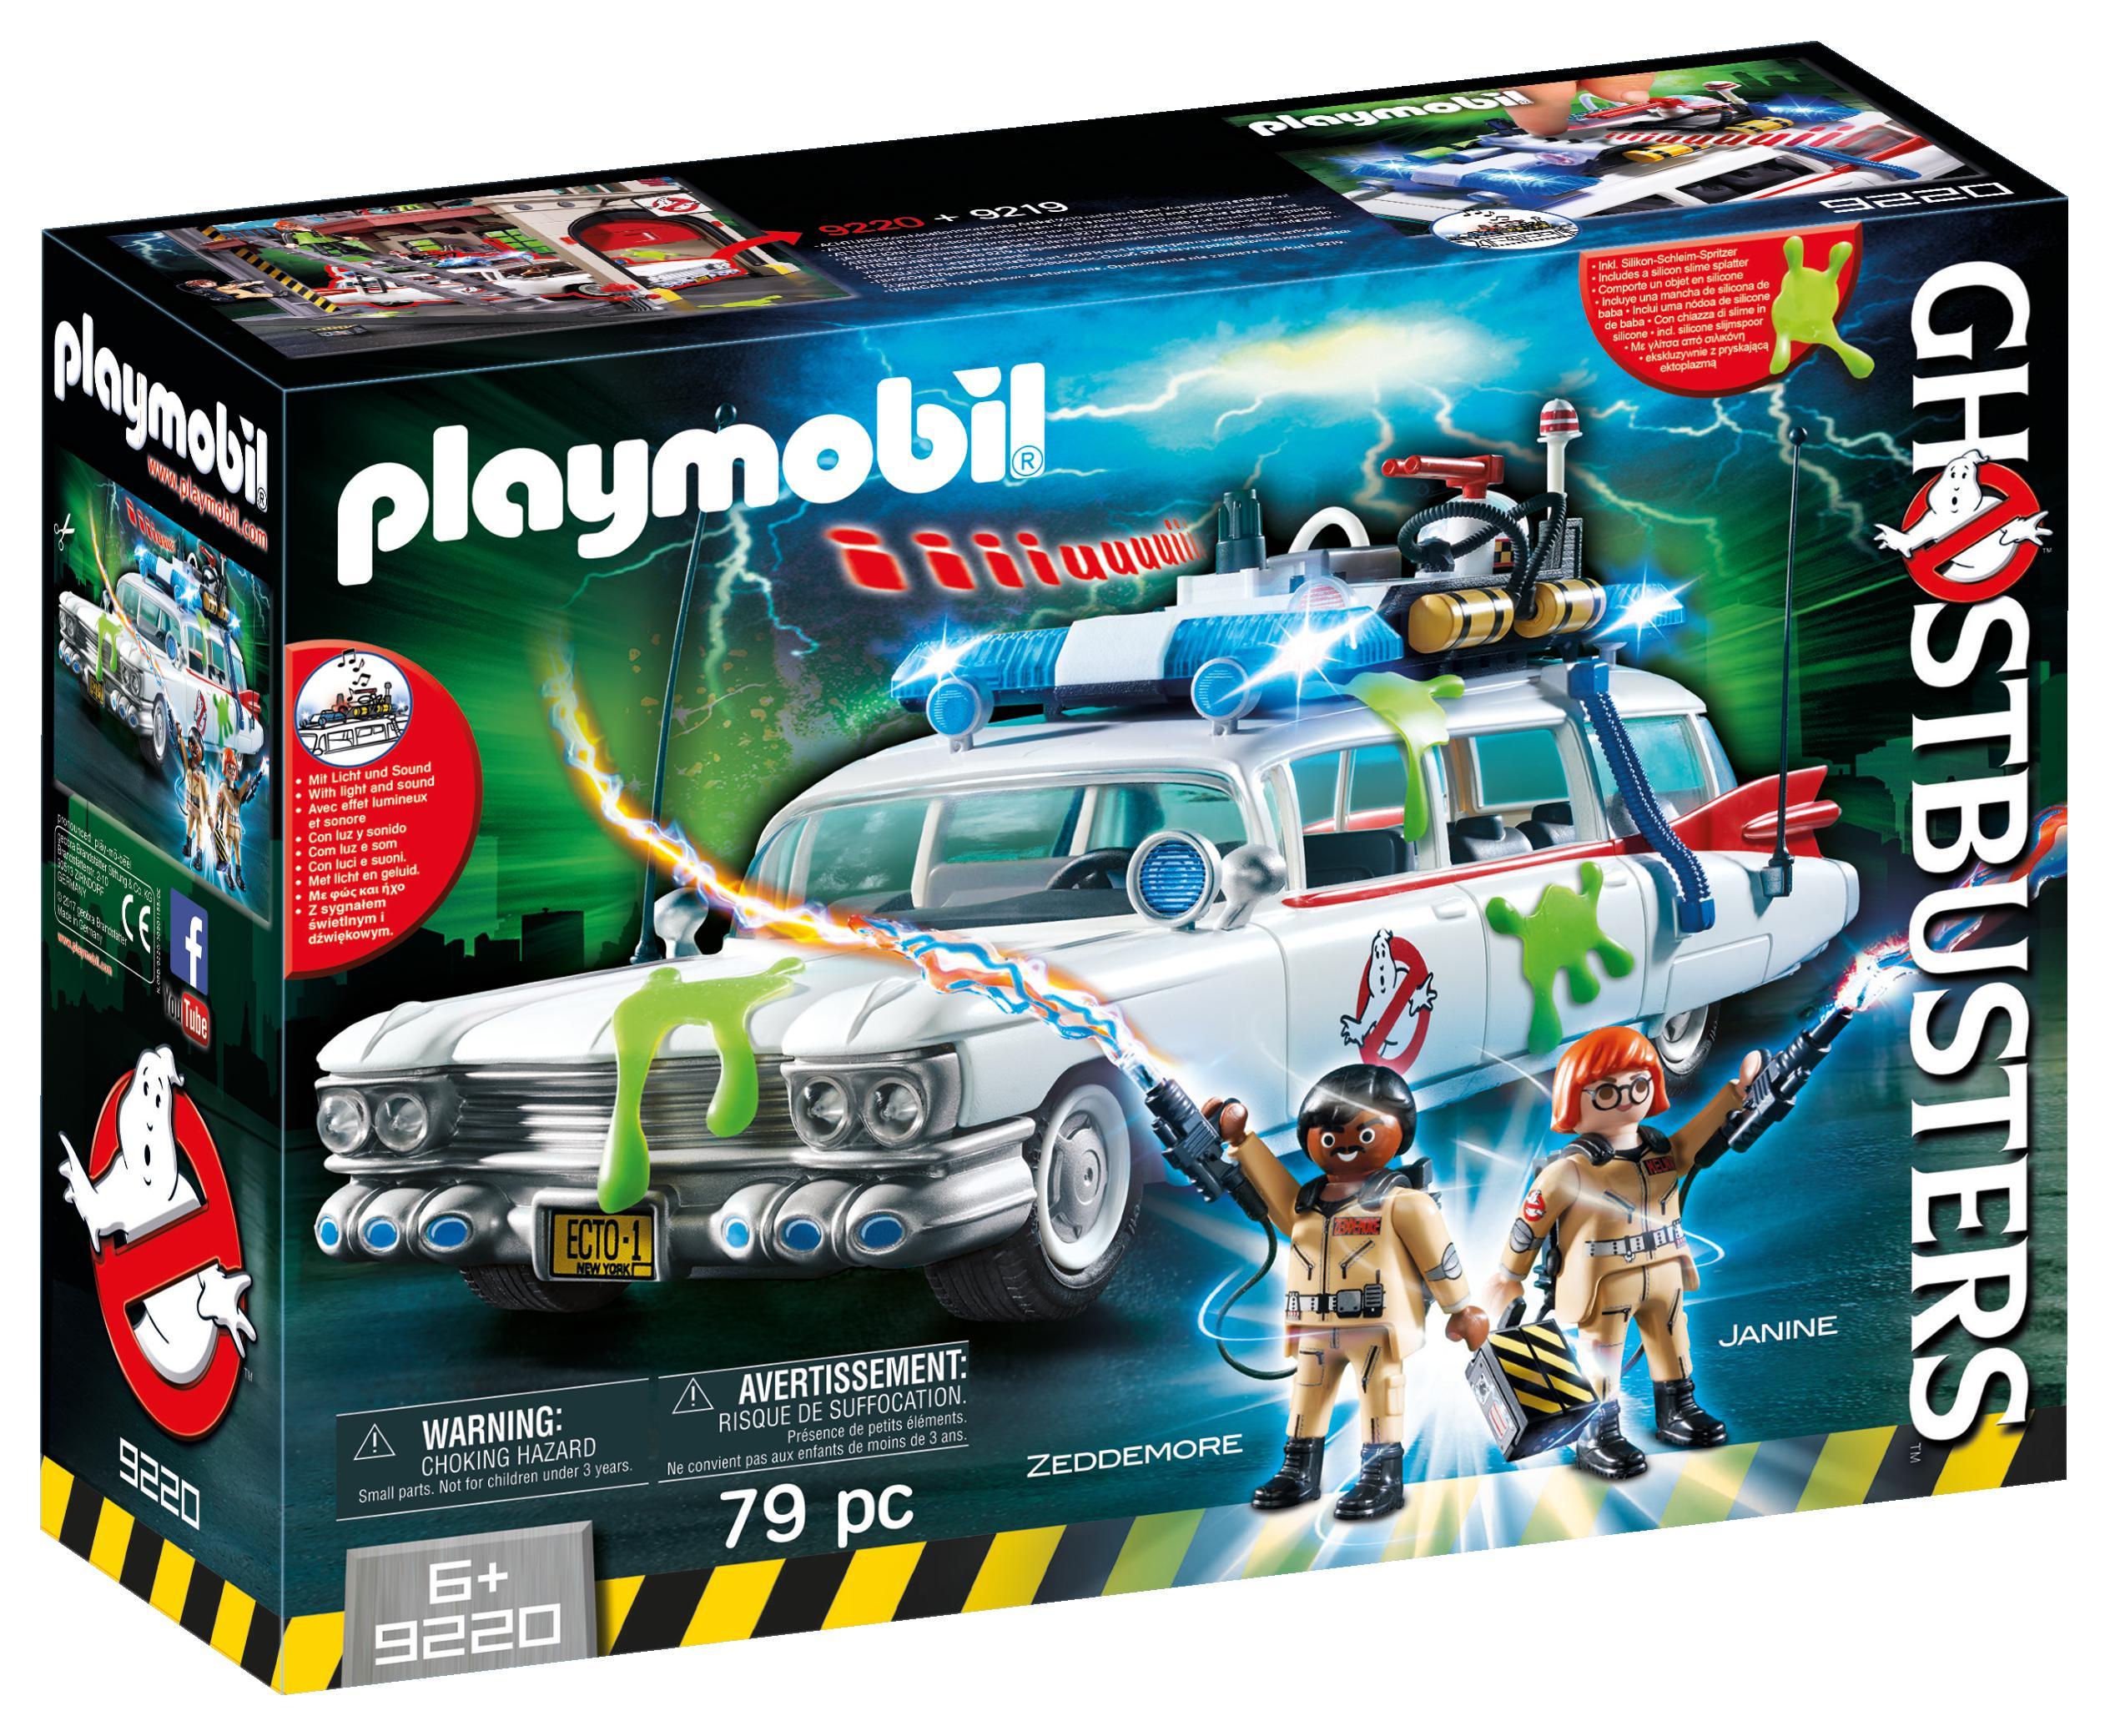 Con Playmobil si gioca a Ghostbusters